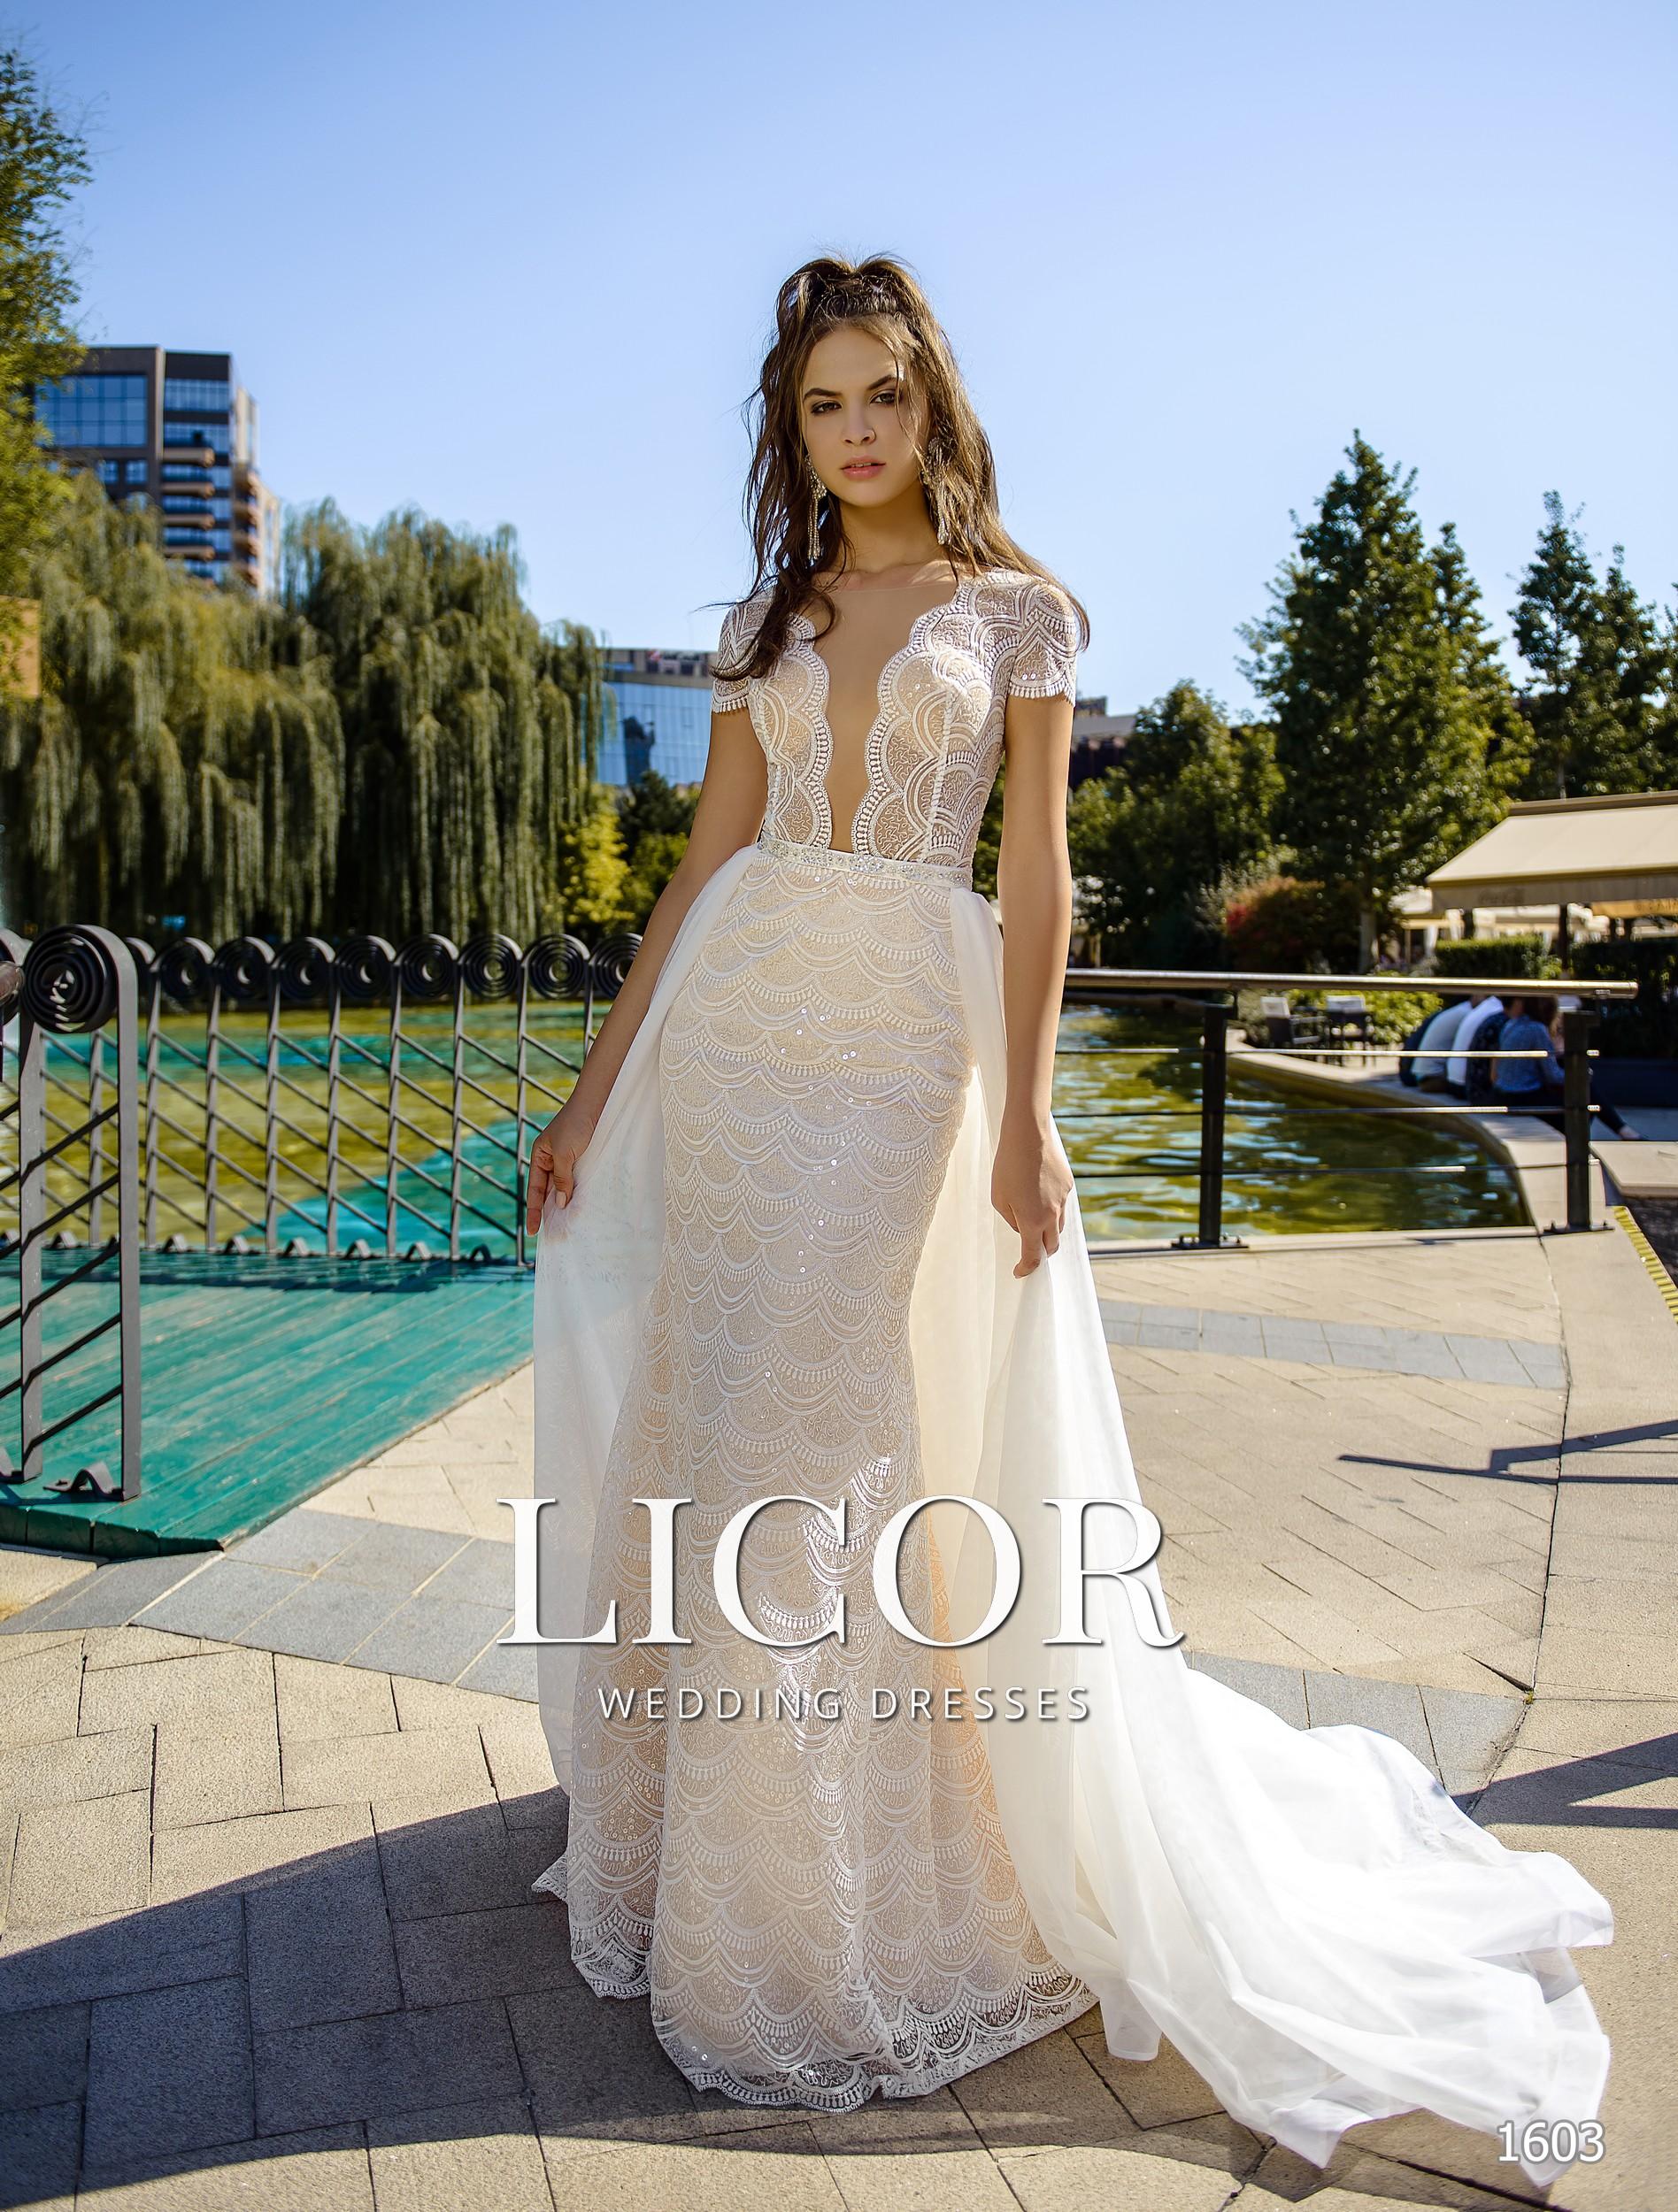 https://licor.com.ua/images/stories/virtuemart/product/1603(1).jpg